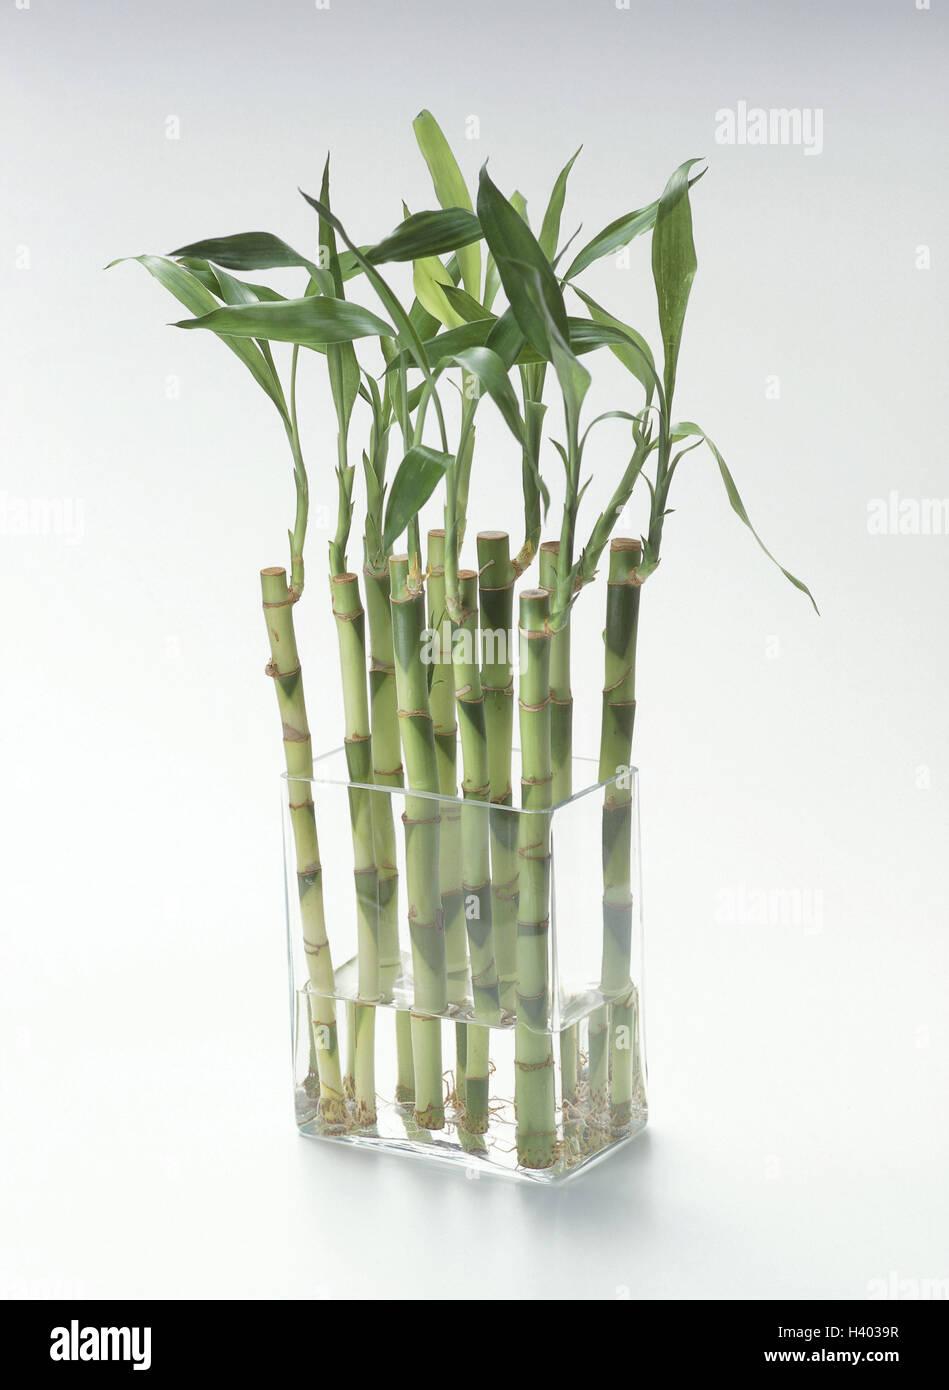 Vase Bambus Glas Glas Vase Bambus Bambusa Grass Typ Stamme